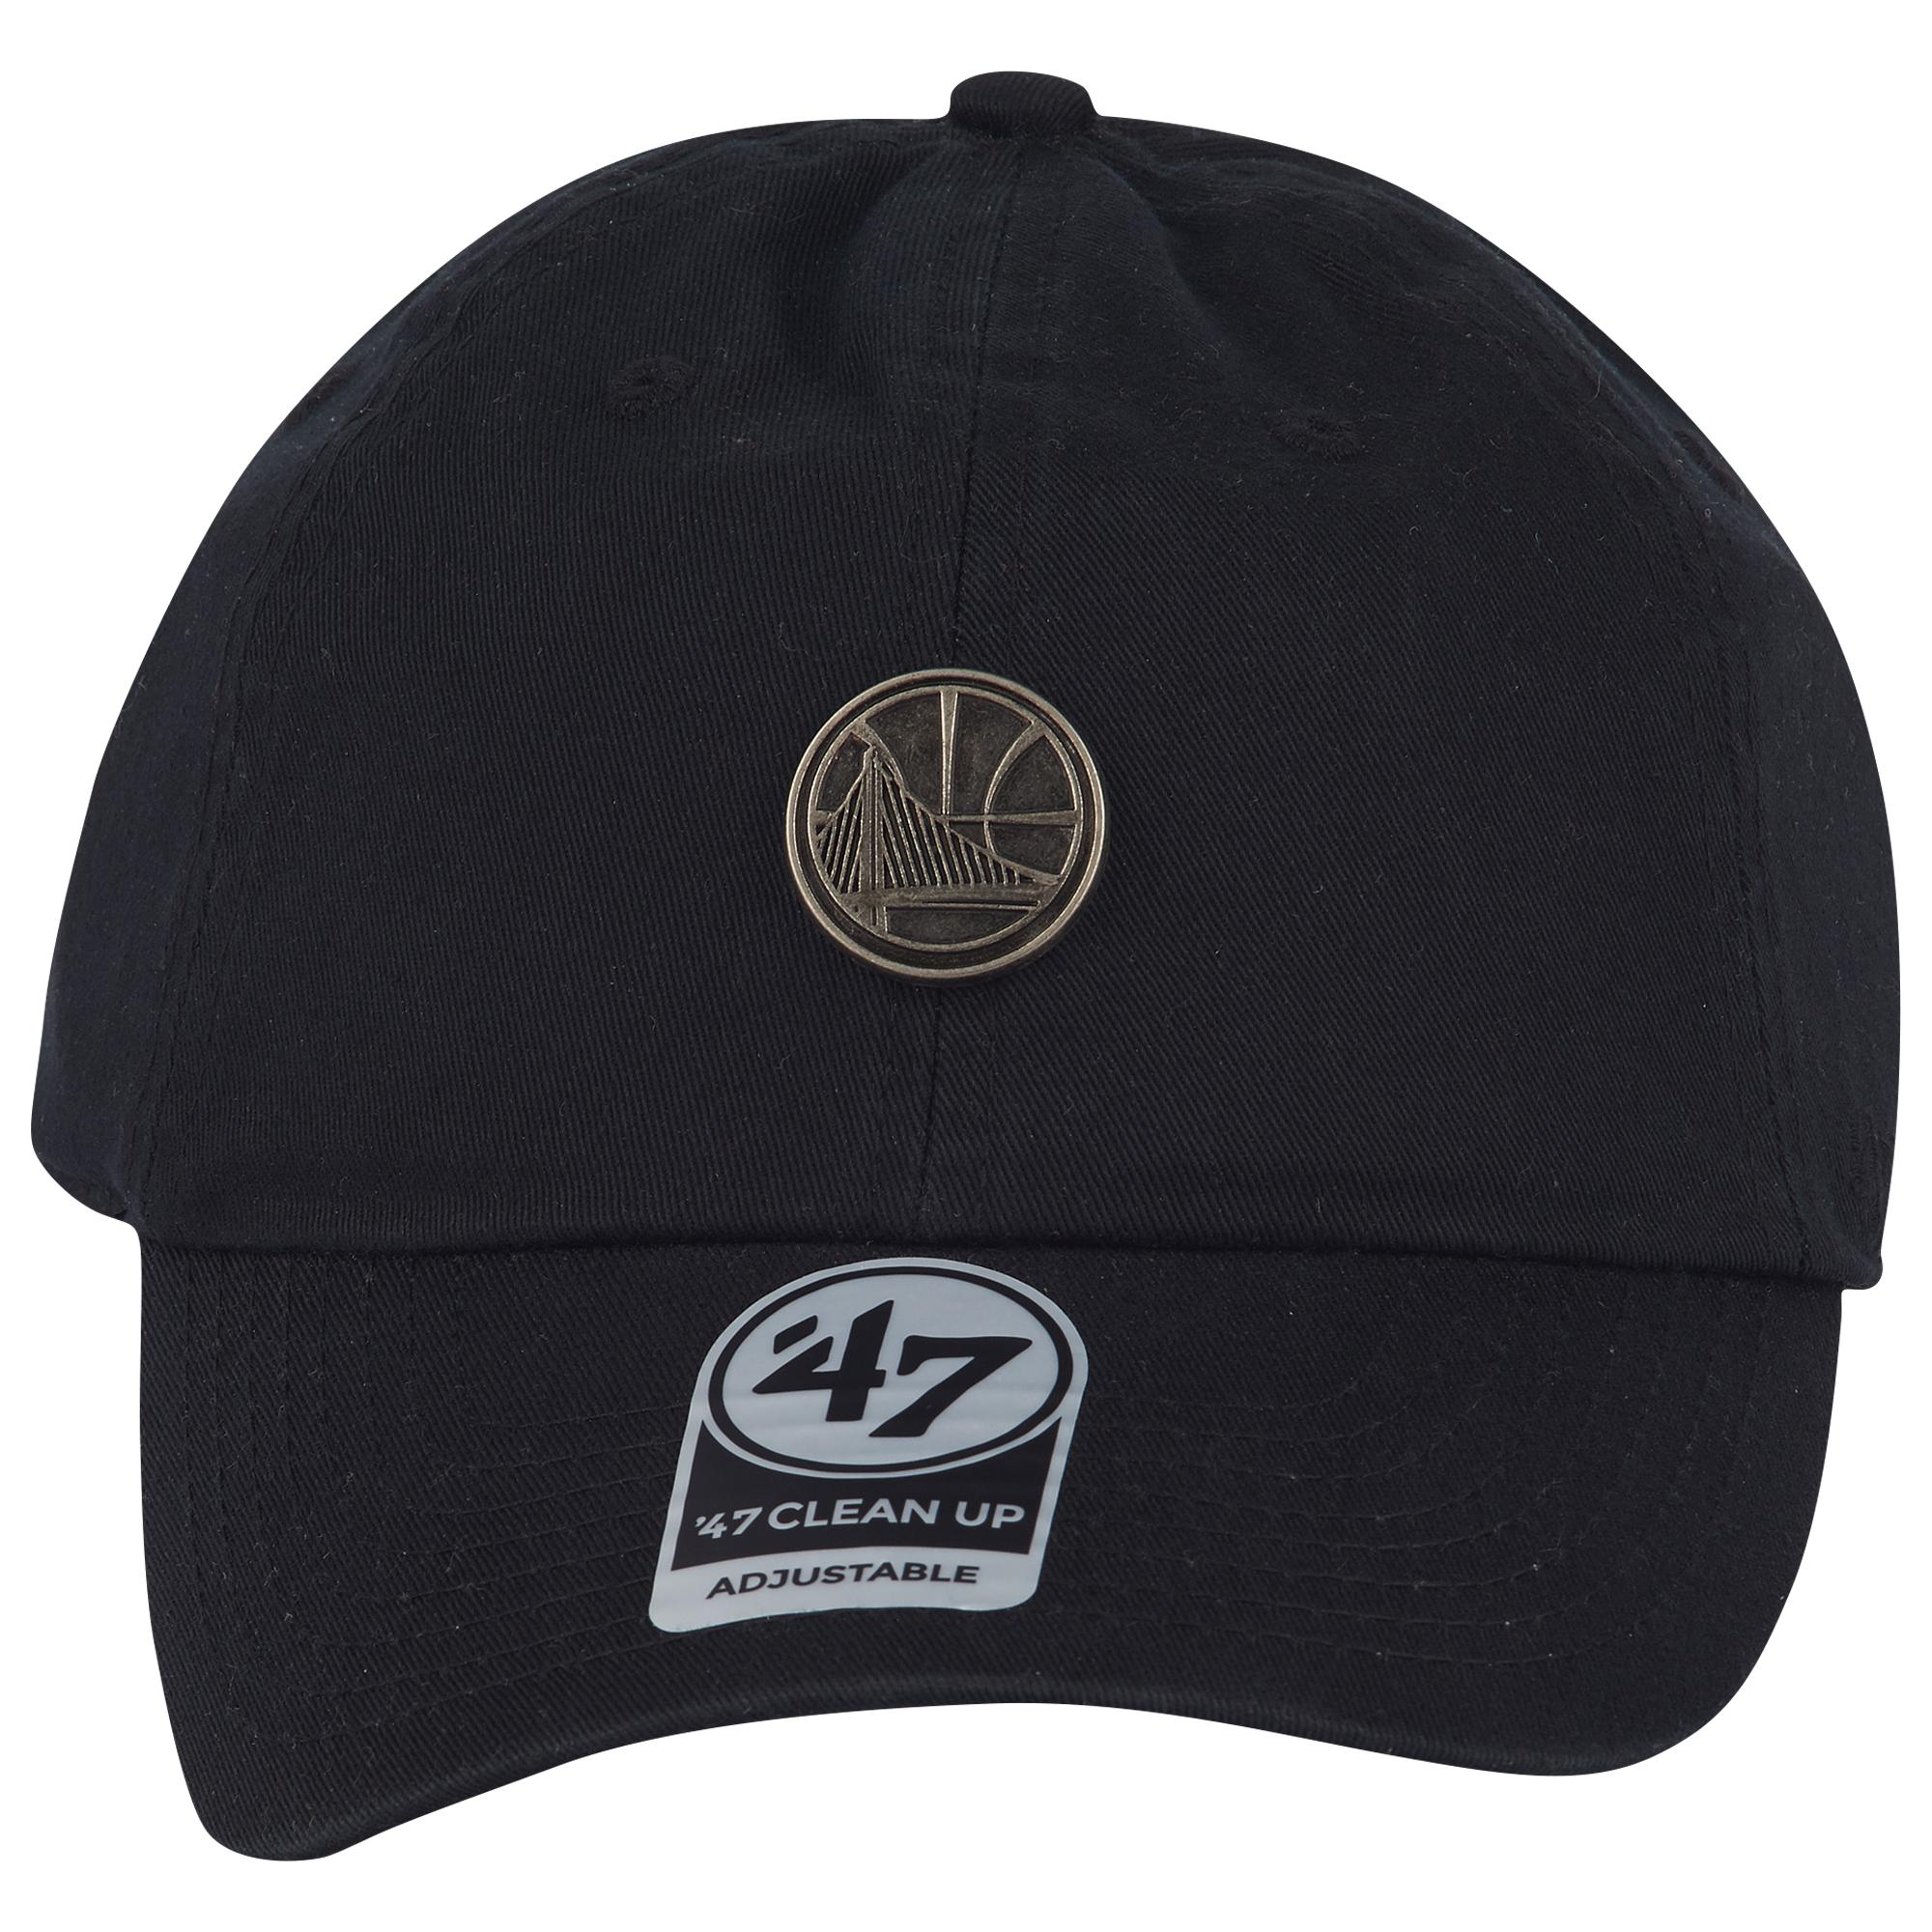 5bb106255c19d1 ... Golden State Warriors Nba Badge Cleanup Adjustable Cap for Men - Lyst.  View fullscreen